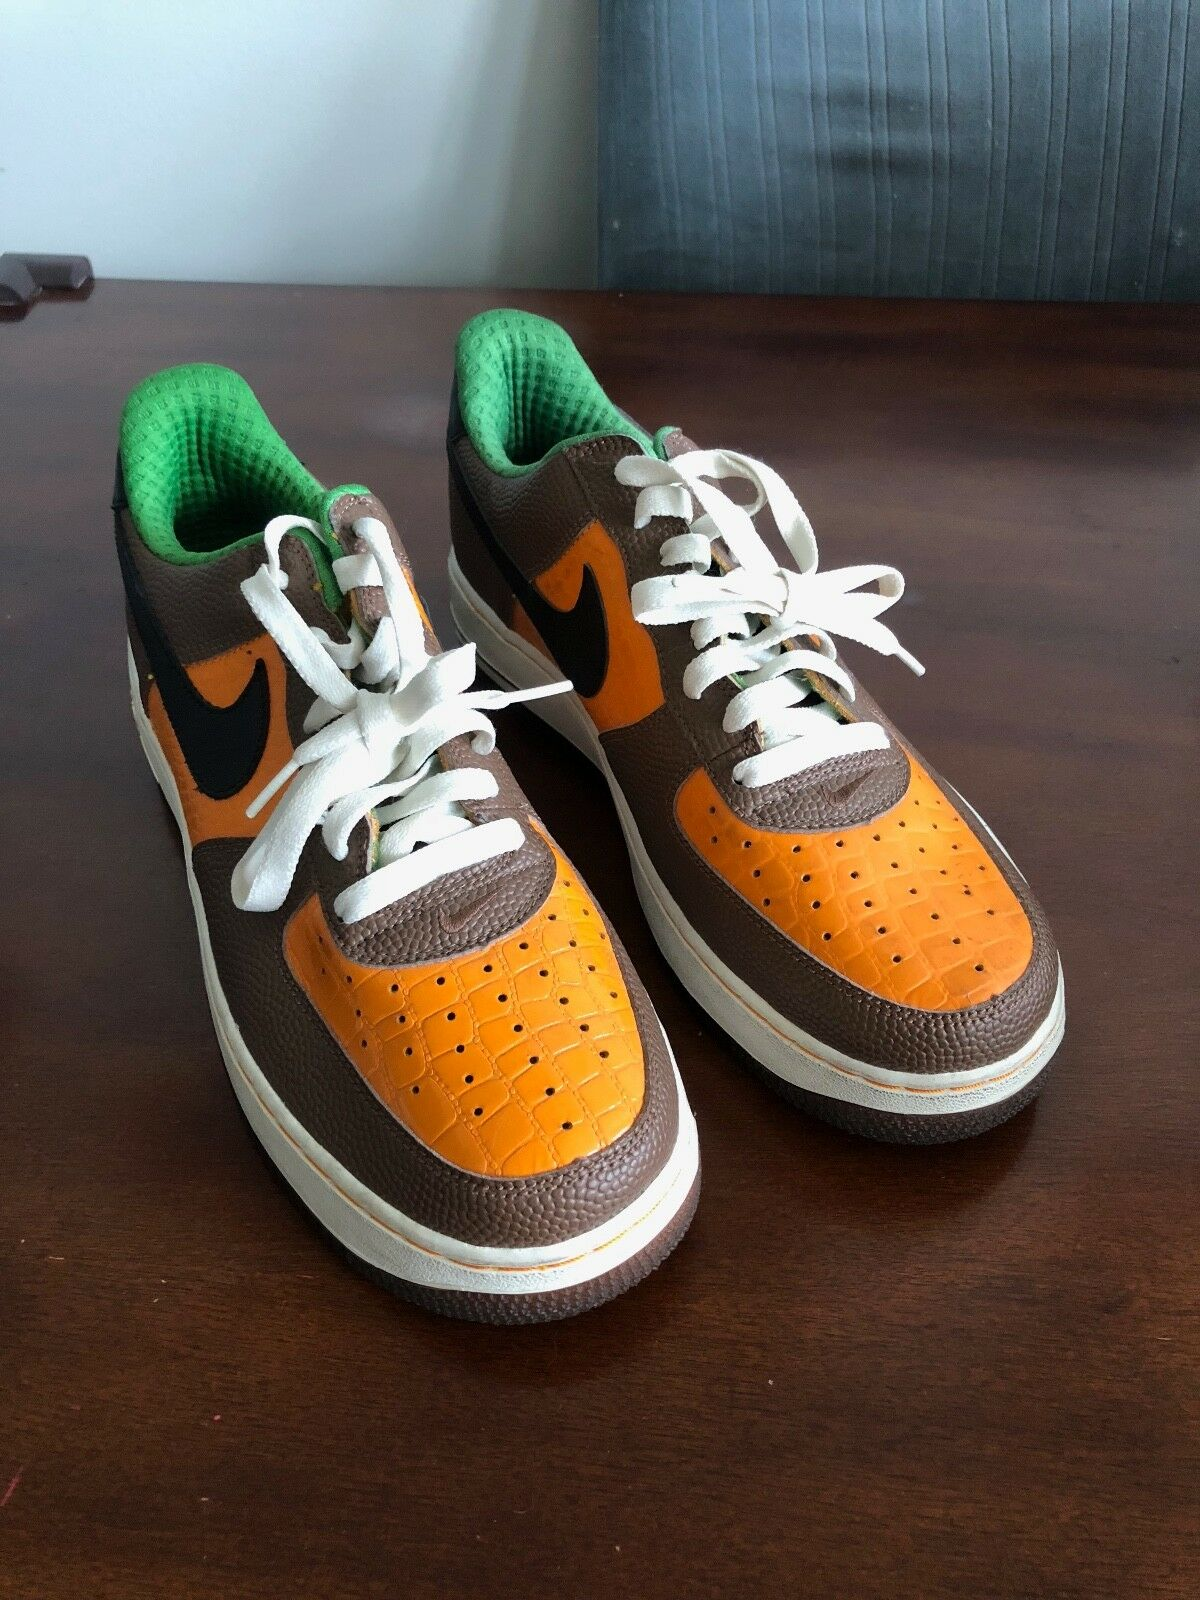 Nike Air Force 1 Premium Superbowl 2006 Size 10US 44EUR Orange/Brown Football